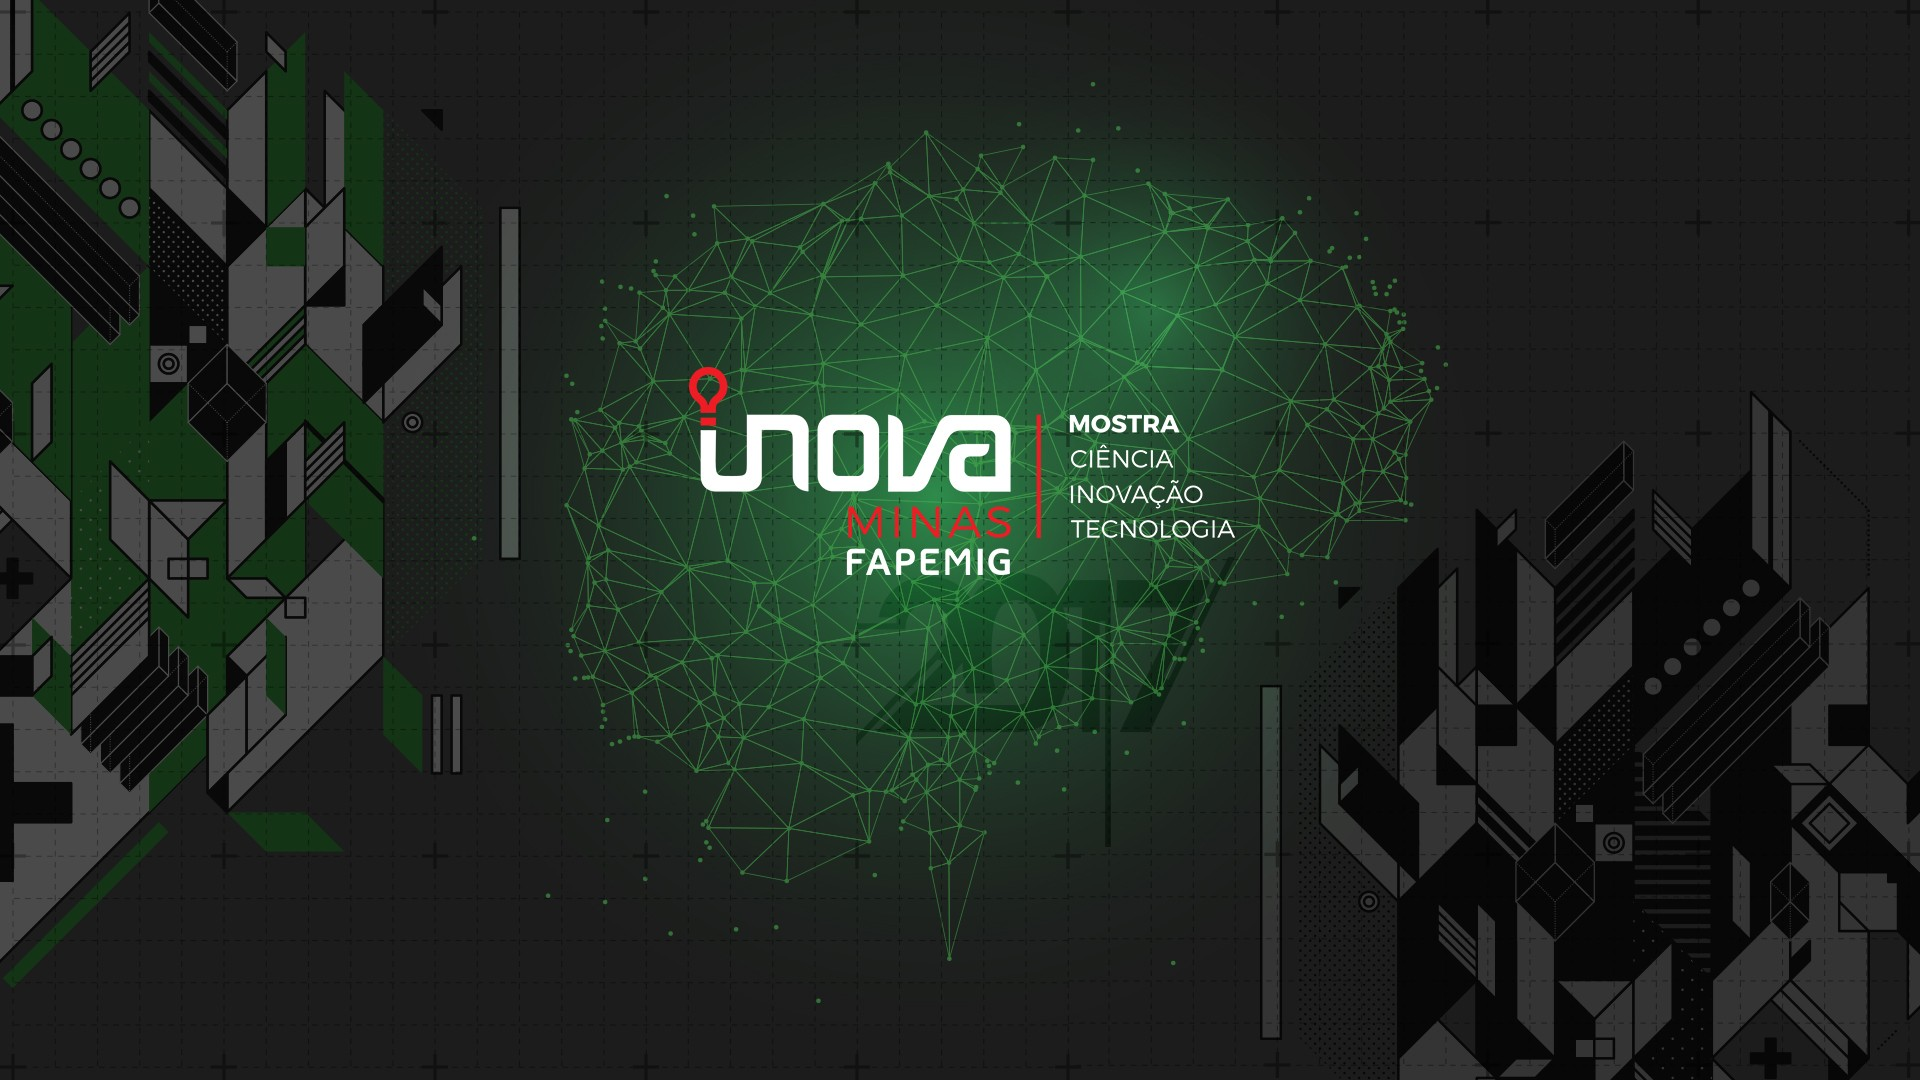 Inova 2017